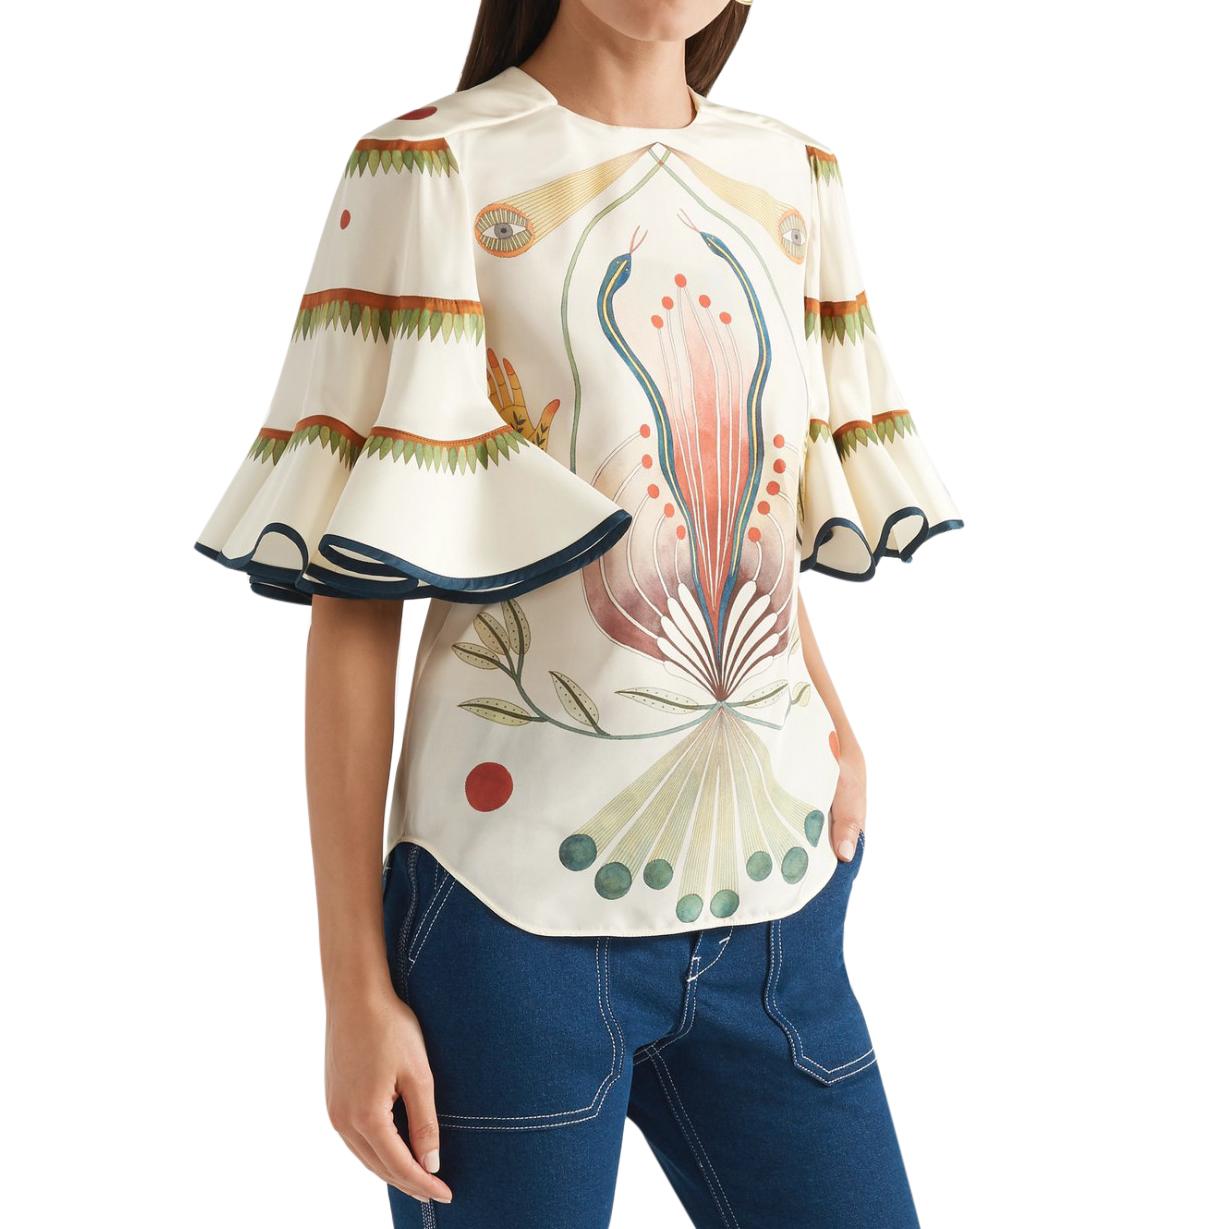 Chloe Ruffled Printed Silk Blouse - Spring '18 Runway Collection